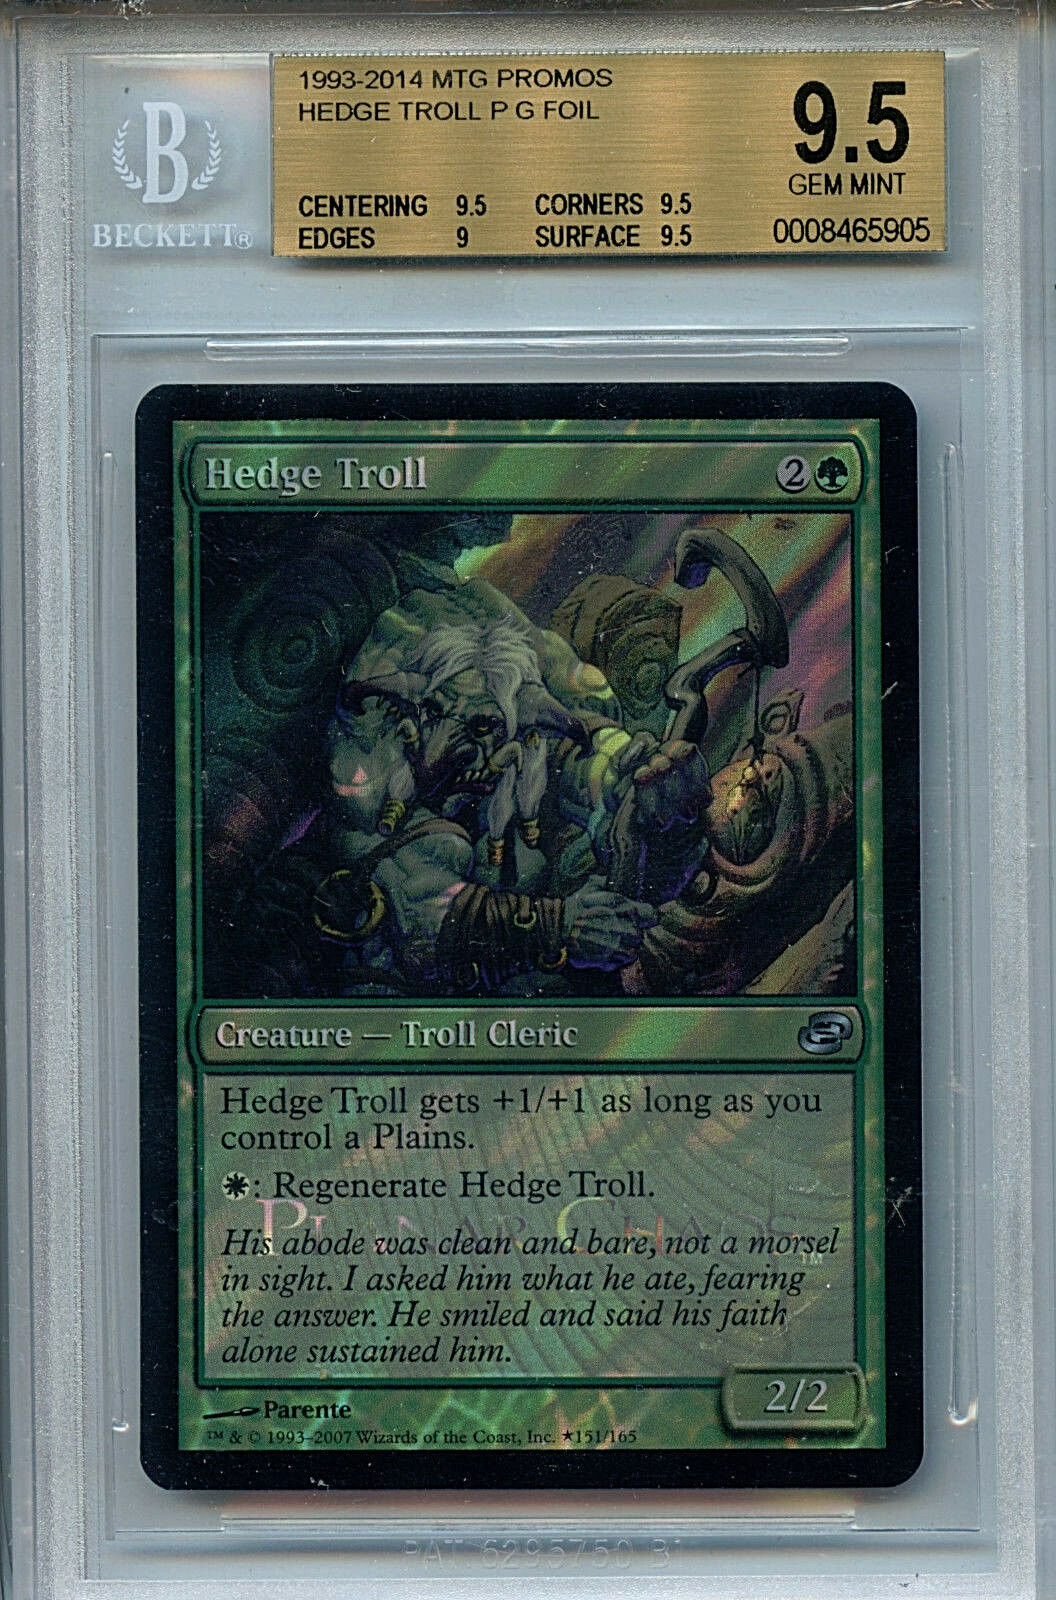 Mtg hedge - troll bgs 9,5 2006 spieler promos 5905 amricons